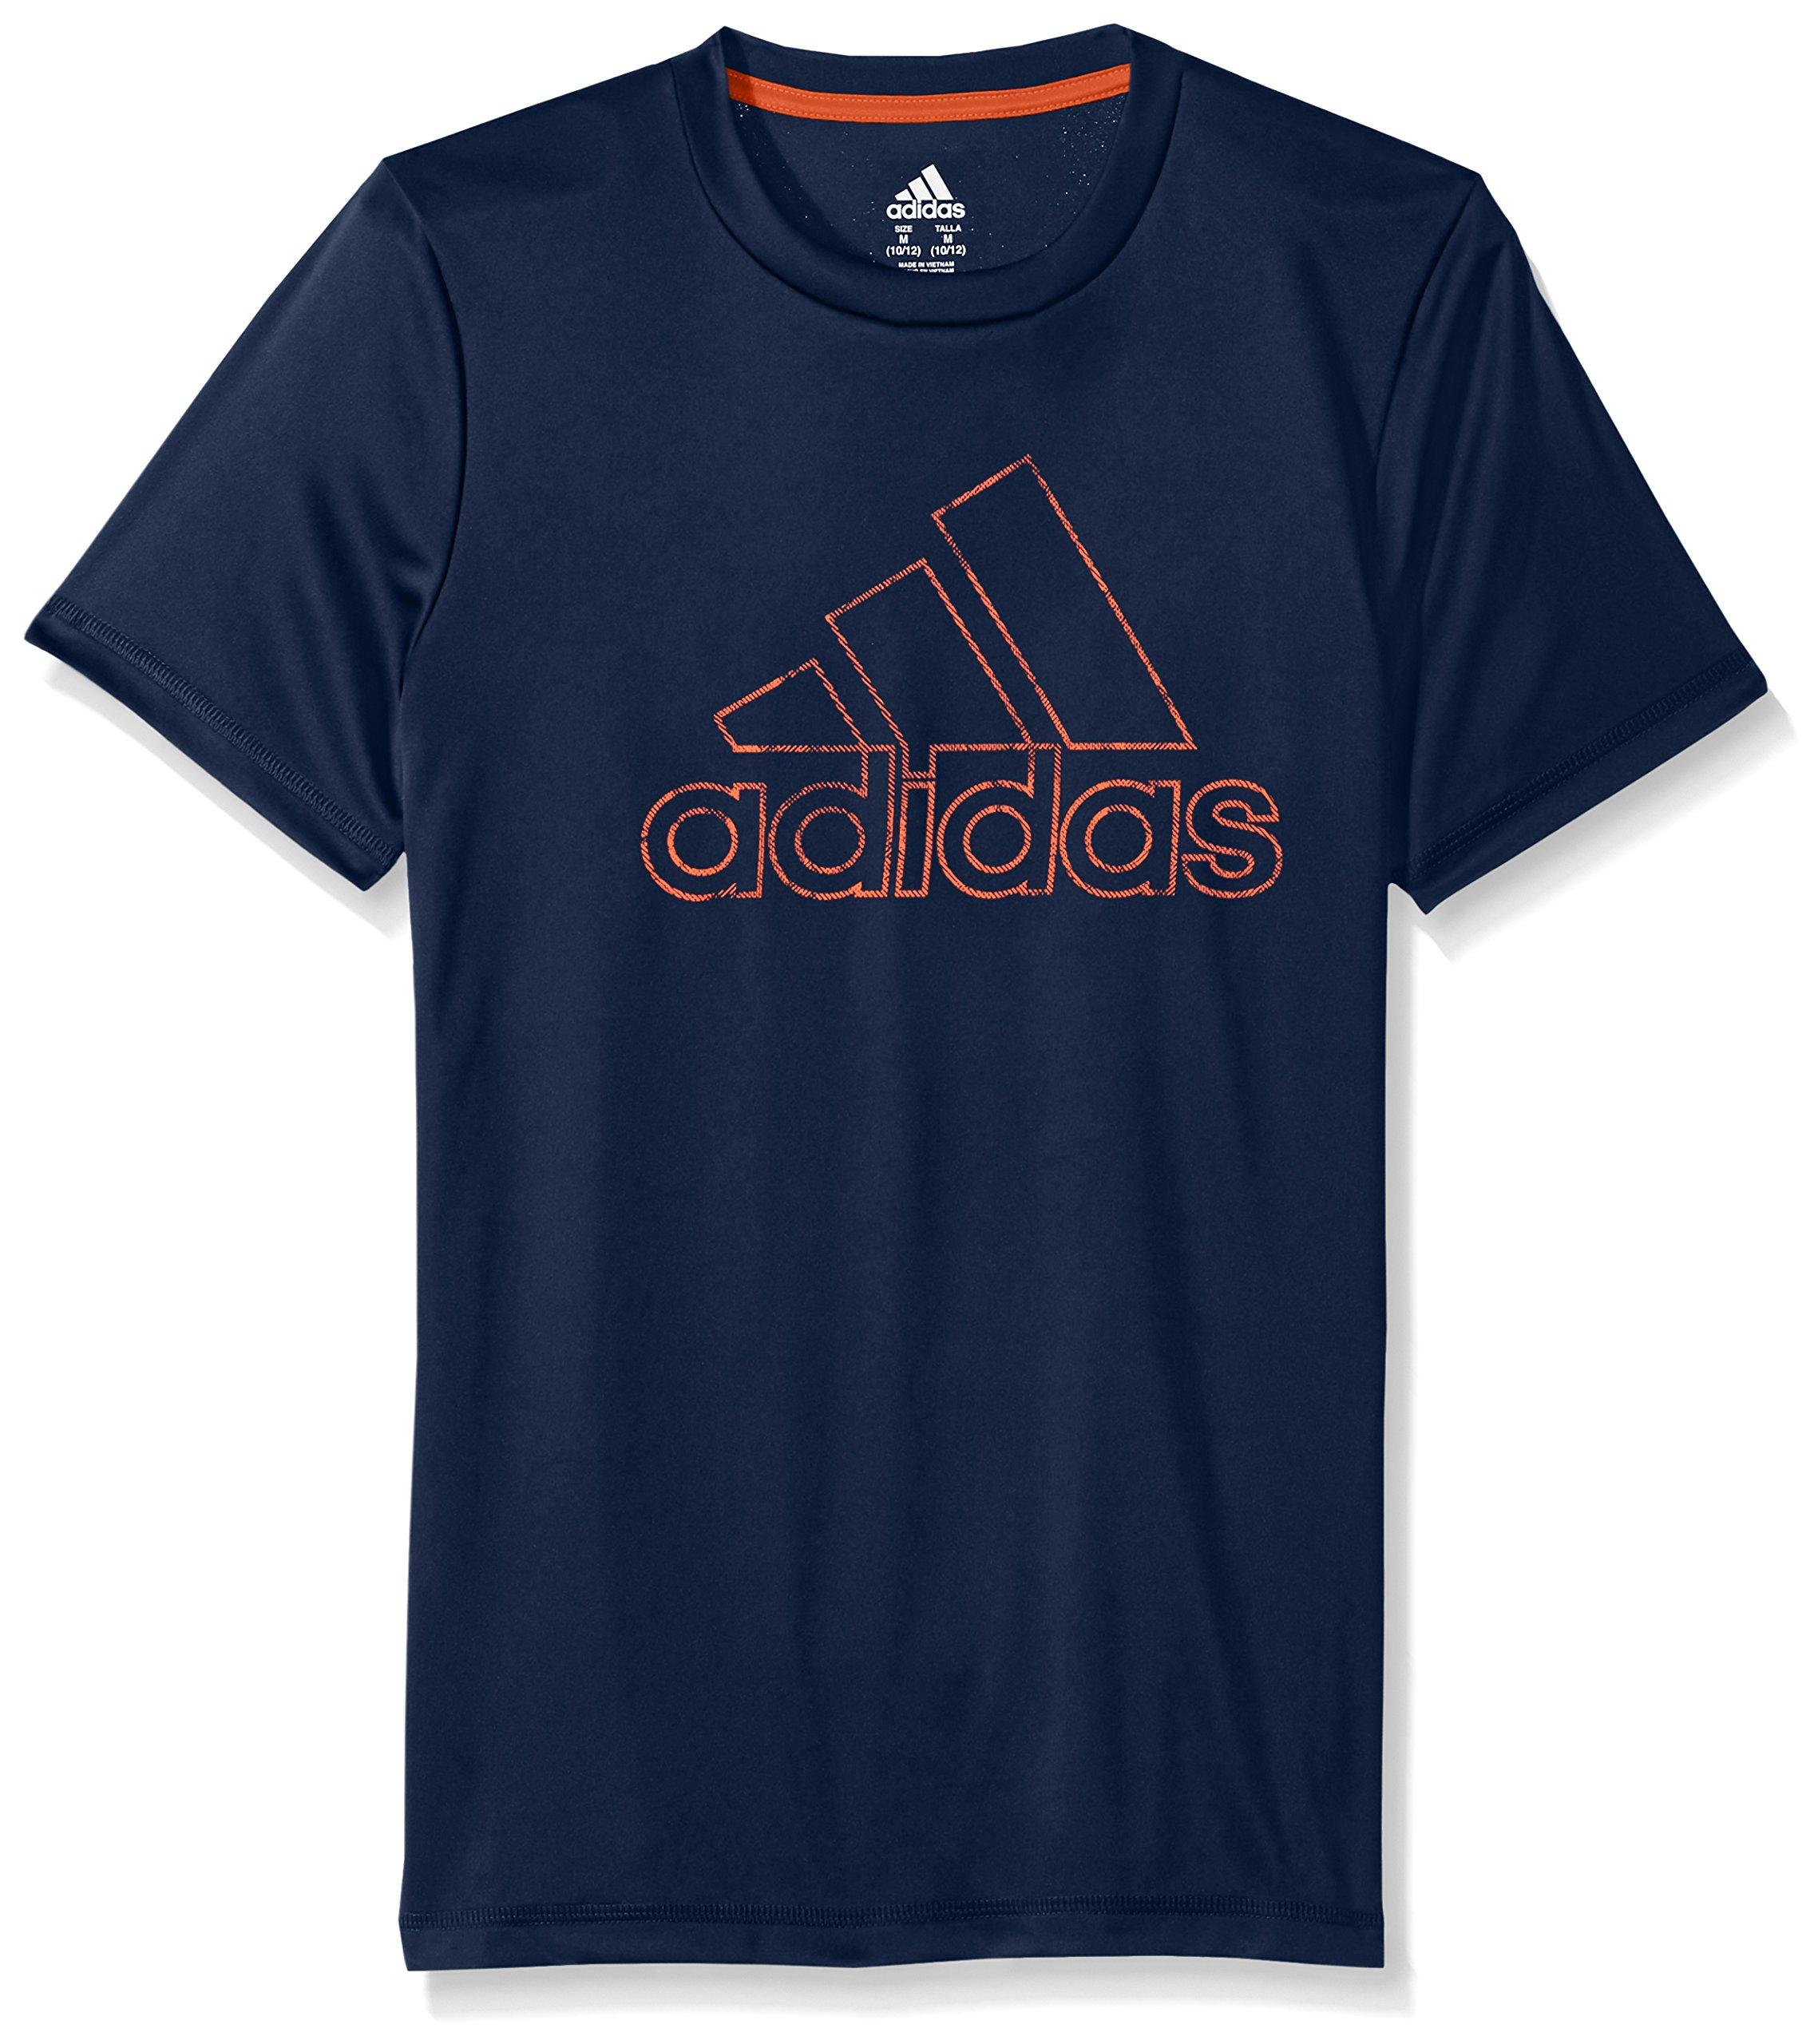 adidas Little Boys' Short Sleeve Logo Tee Shirt, Collegiate Blue, 6 by adidas (Image #1)